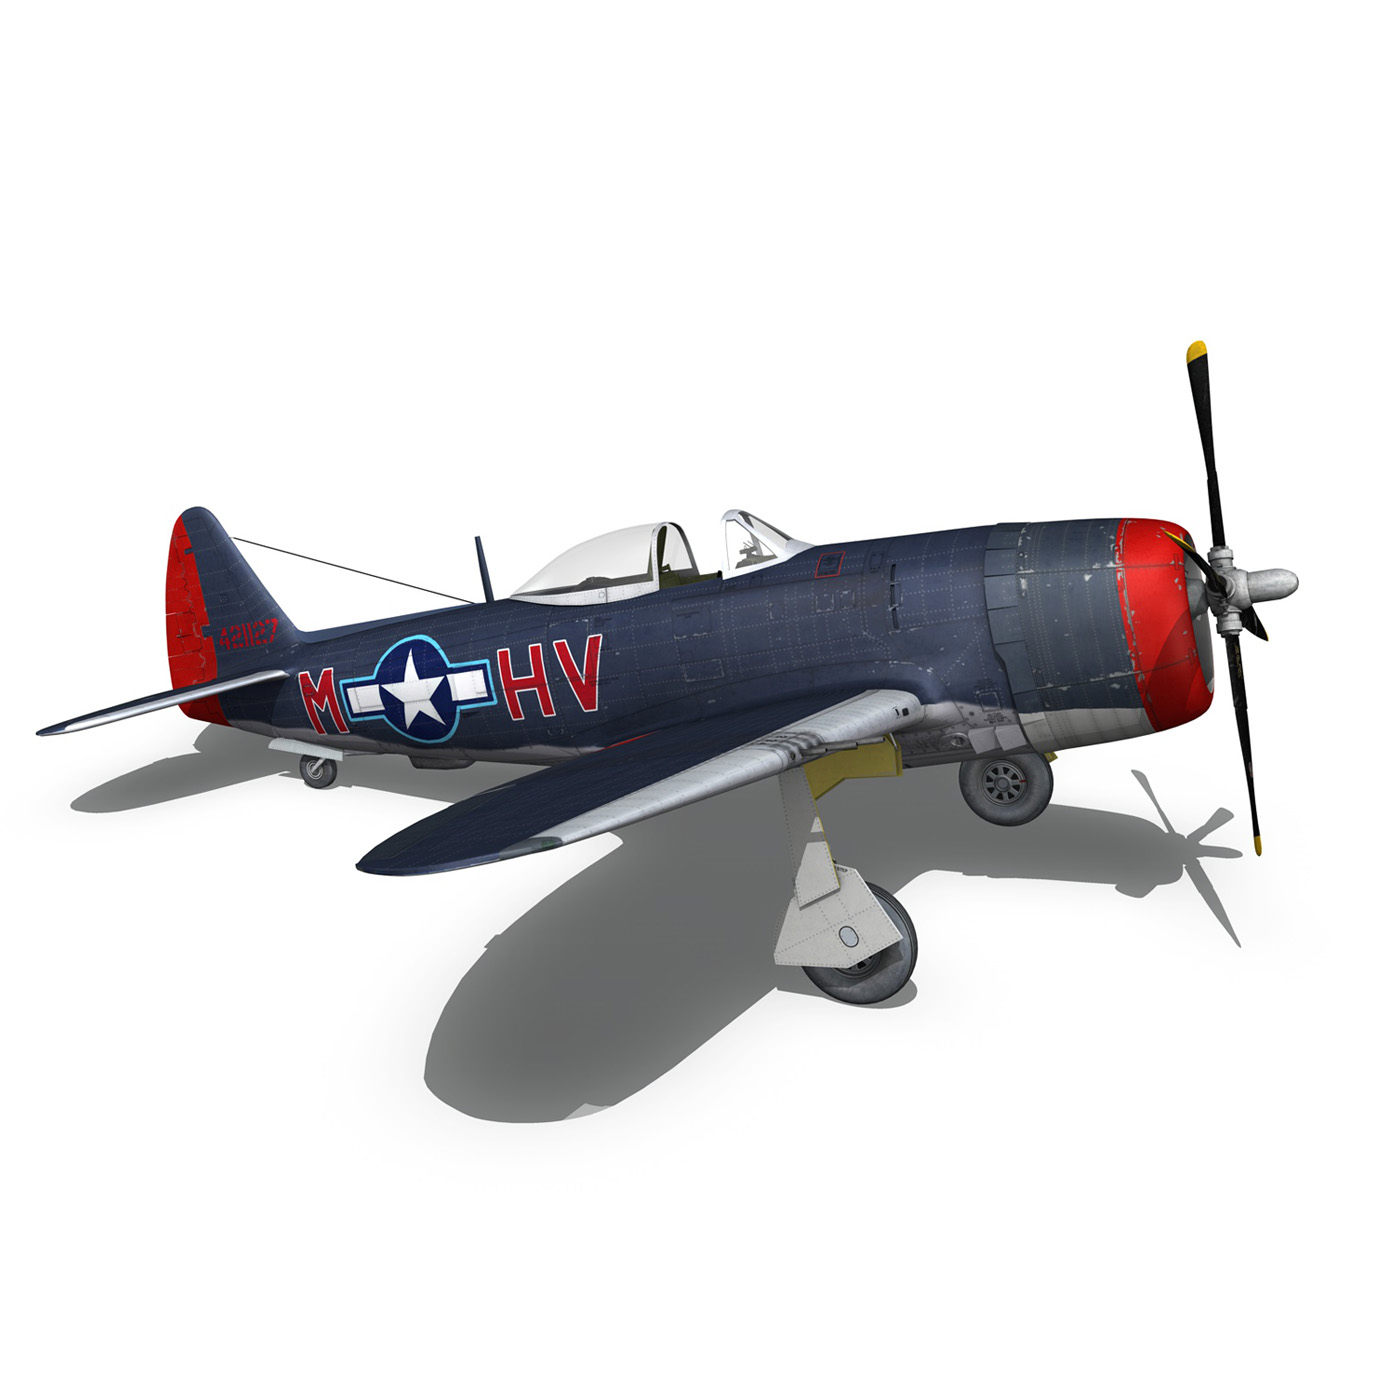 republic p-47m thunderbolt – pengie v 3d model 3ds c4d fbx lwo lw lws obj 279729